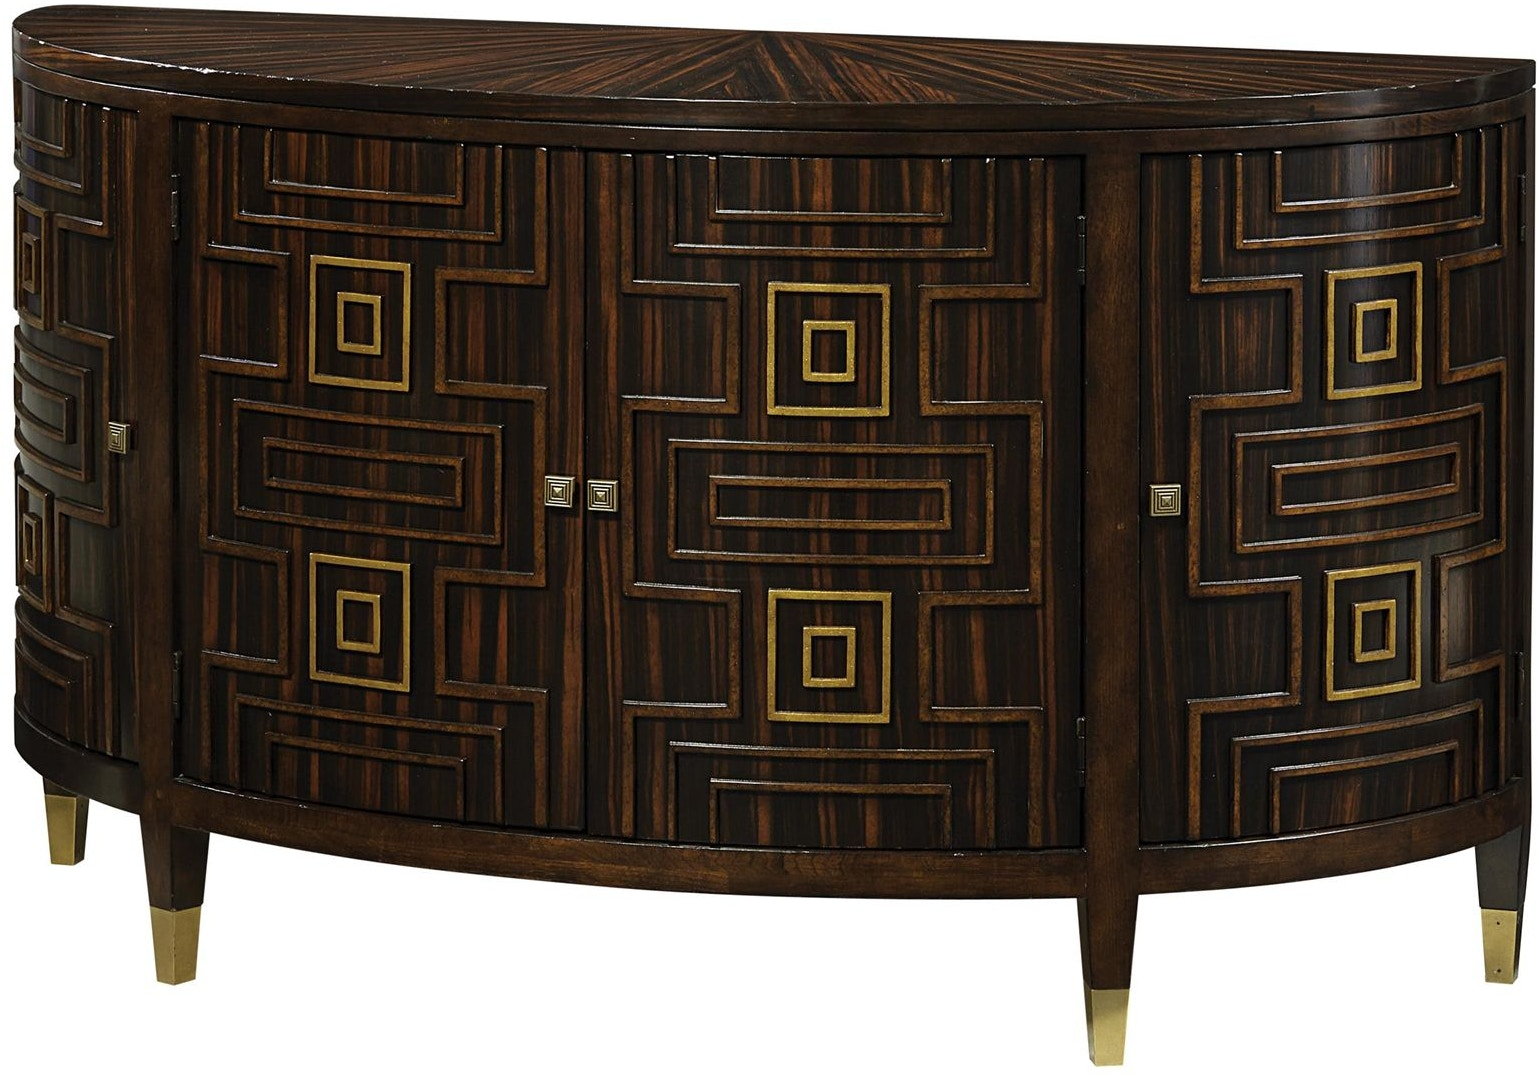 Fine Furniture Design Half Moon Bay Demilune Cabinet 1428 850. Fine Furniture Design Dining Room Half Moon Bay Demilune Cabinet